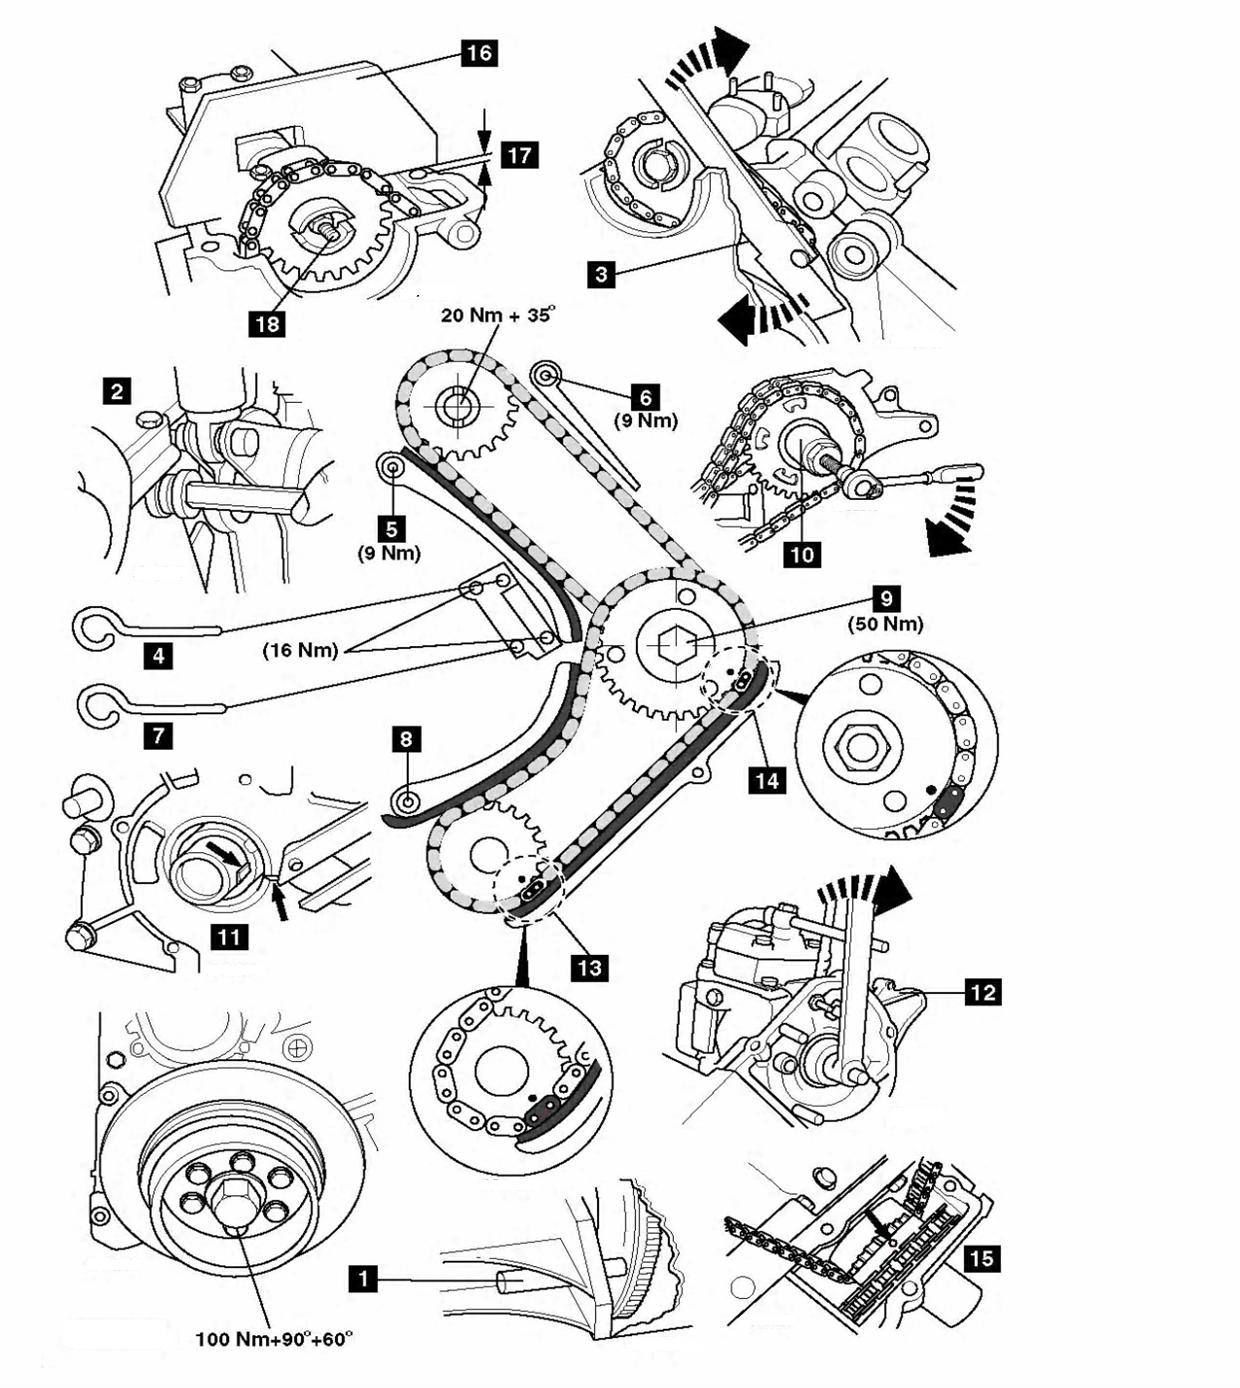 we are currently rebuilding a 1998 range rover 2 5 dse timing marks of landrover v6 2003 nissan h20 engine timing marks diagram